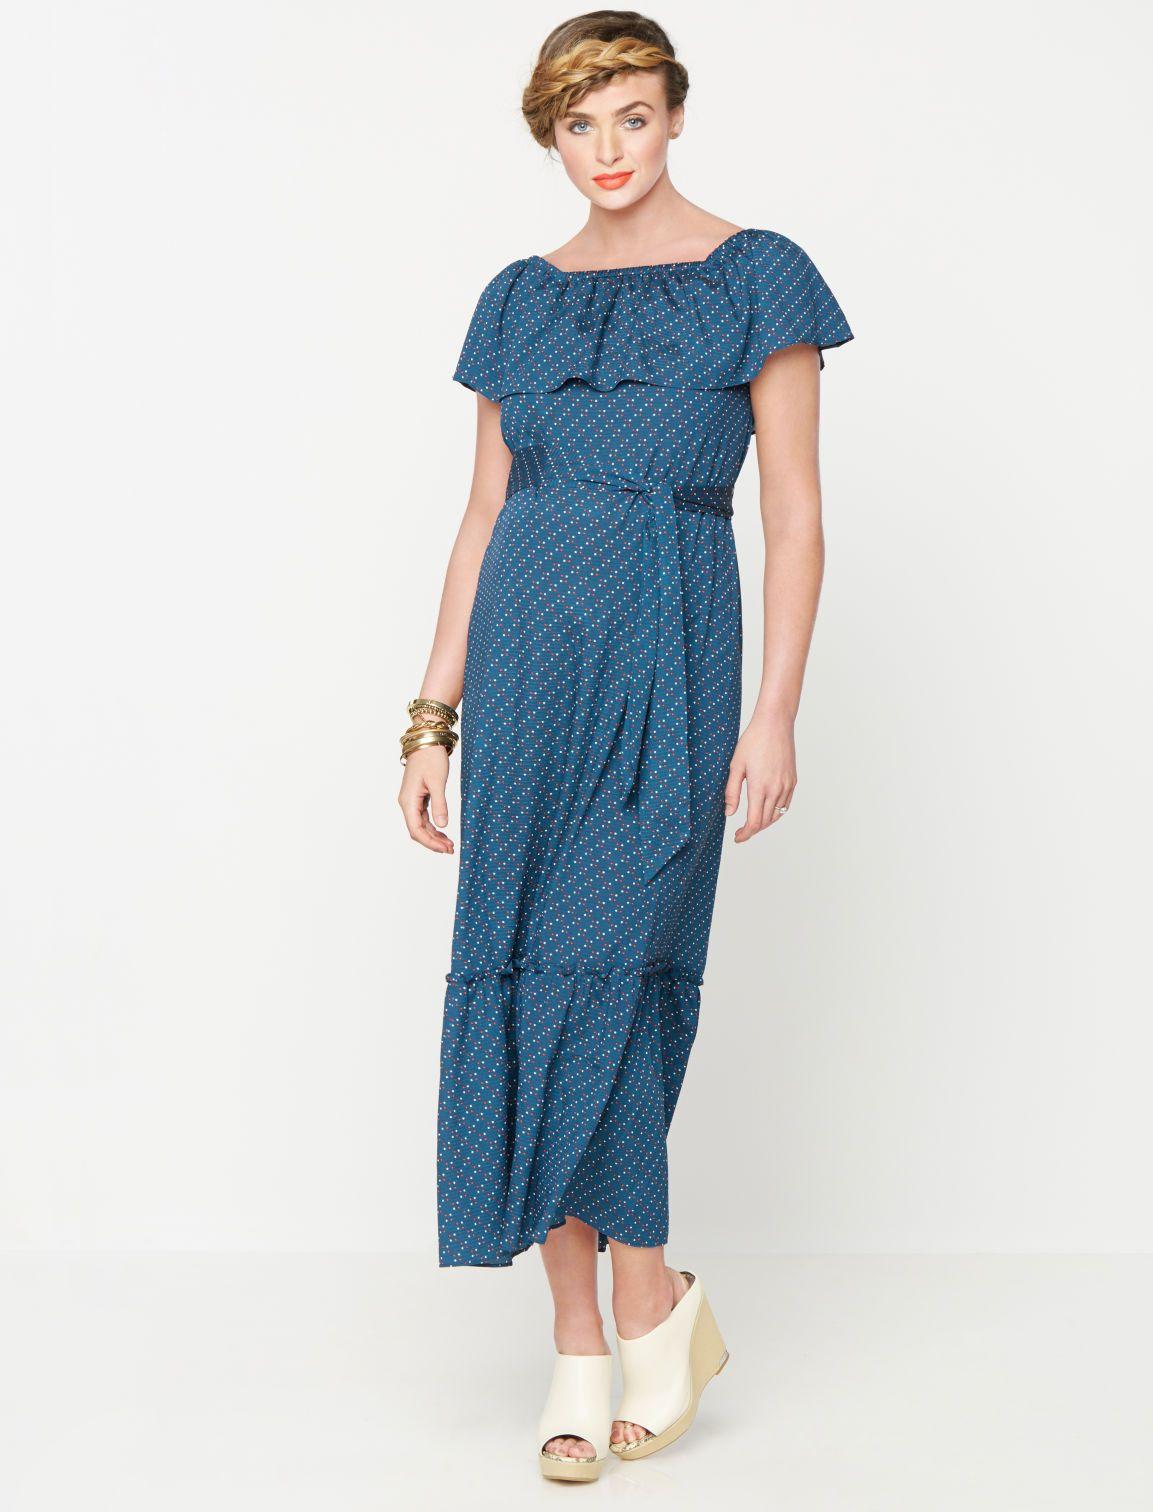 cb62e562f7fba Rachel Zoe Sleeveless Off The Shoulder Maternity Dress in Dot Print ...